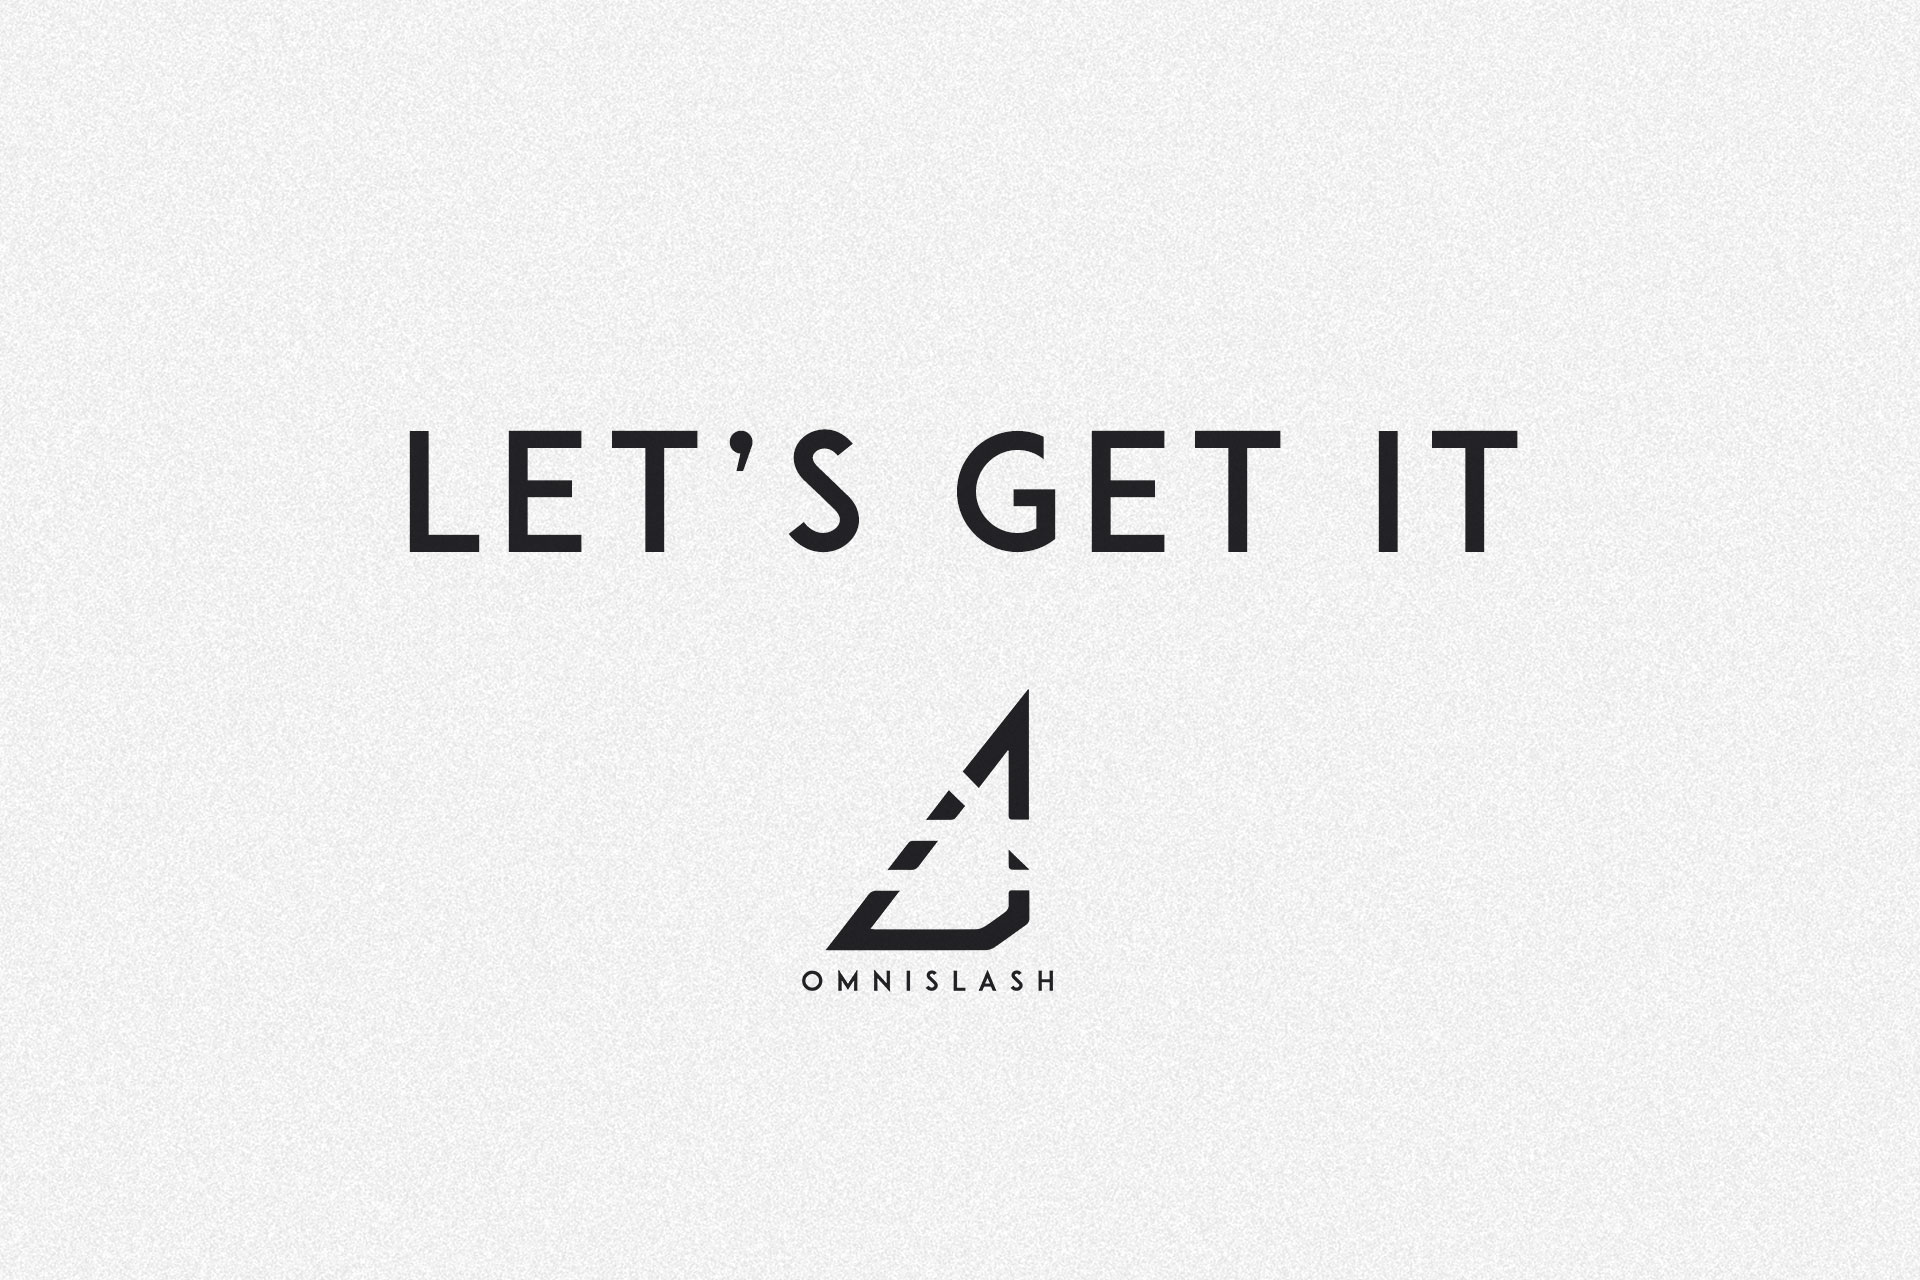 Let's Get it - Key Links